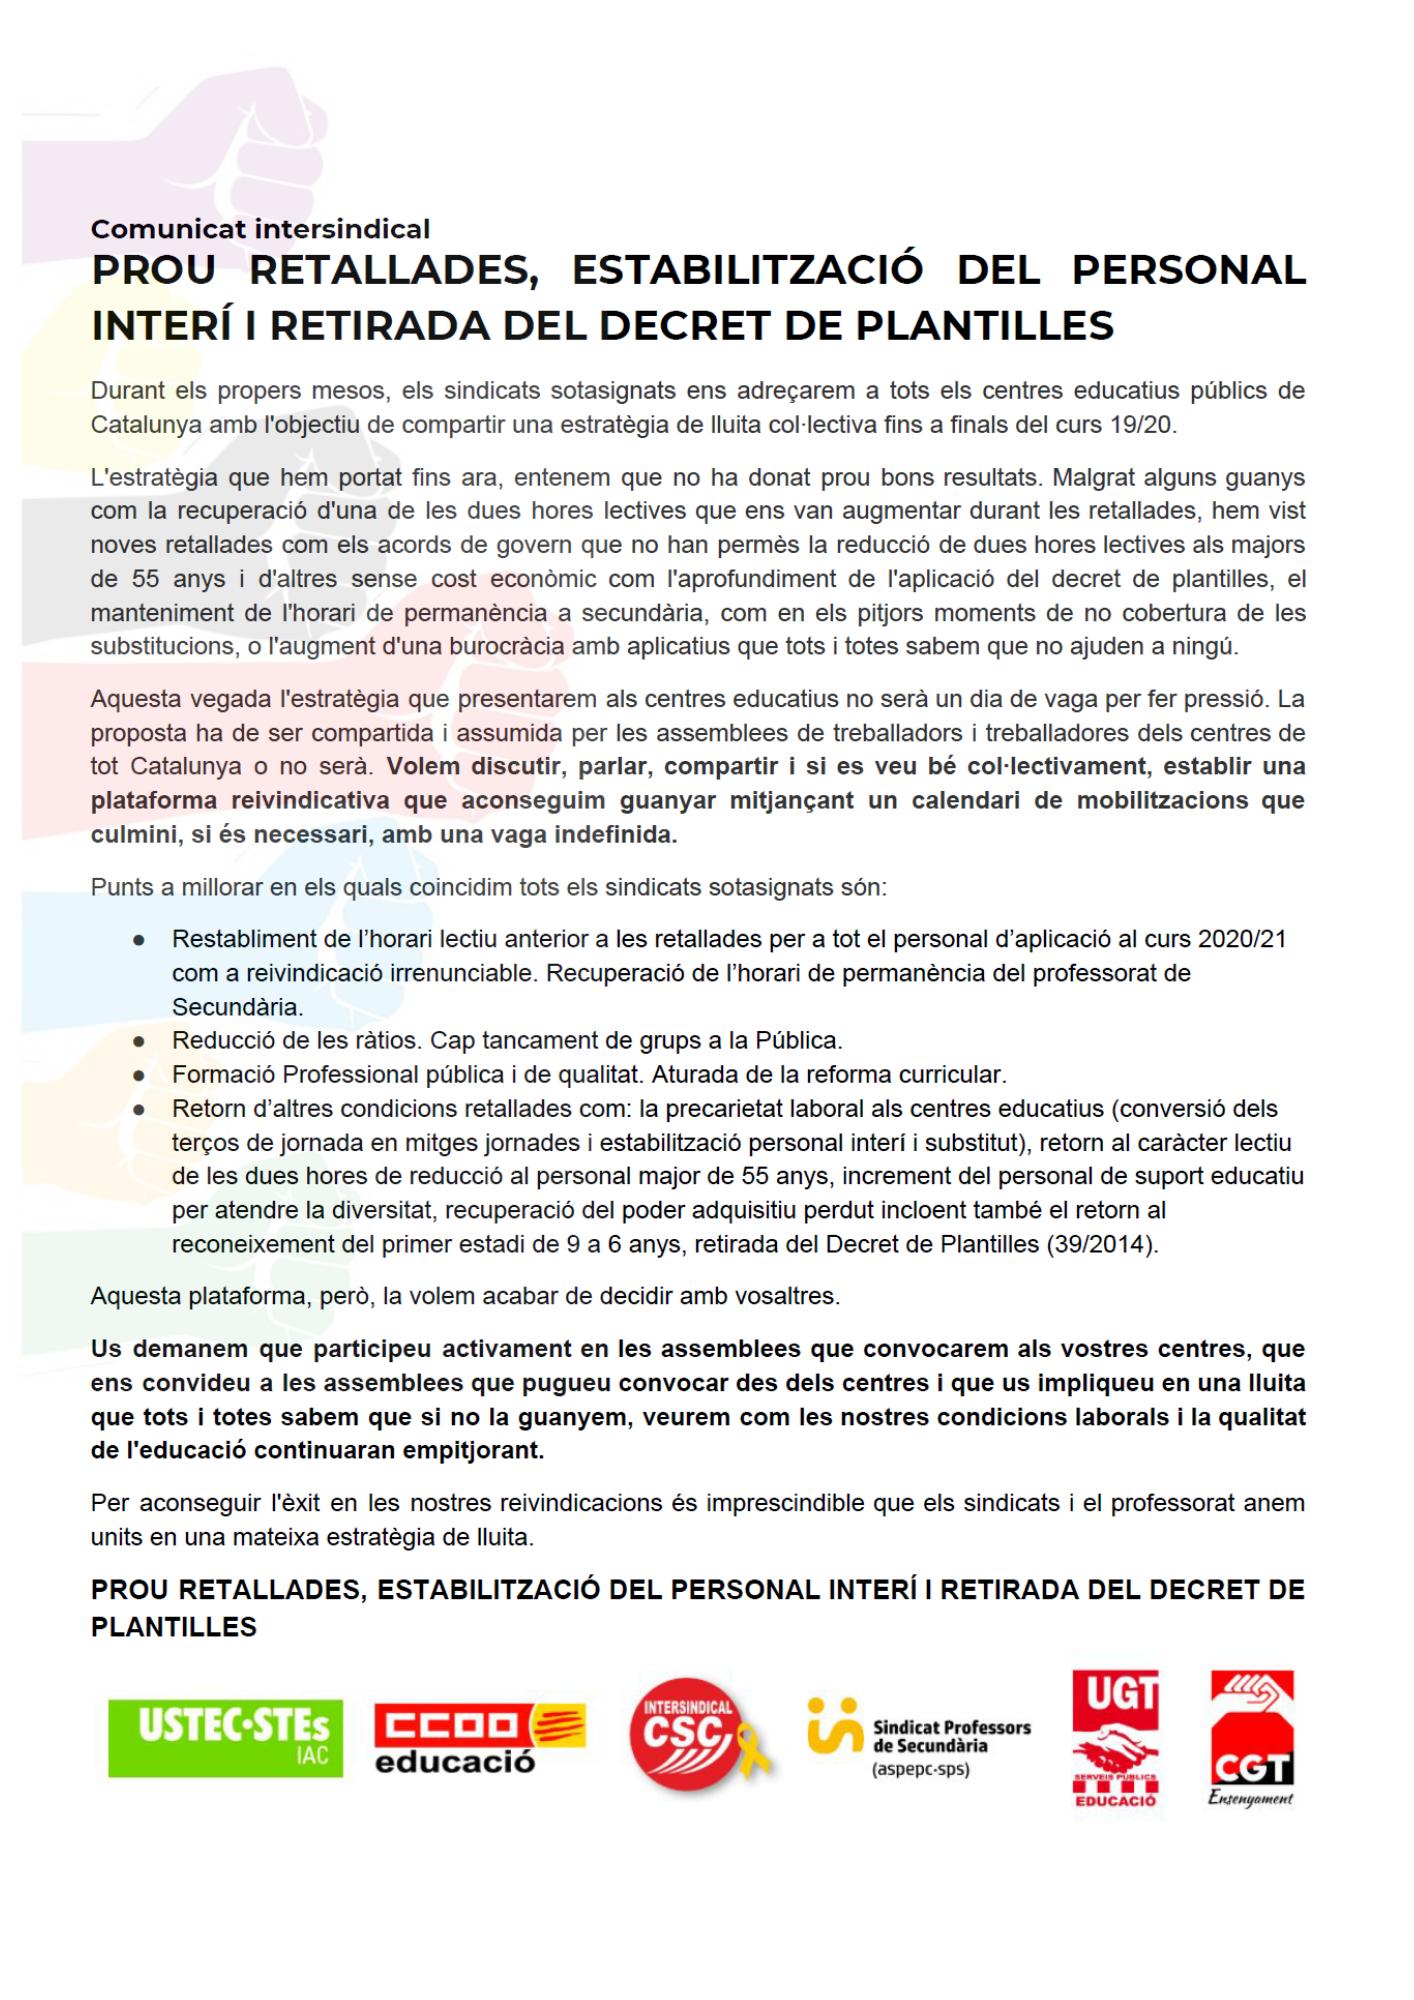 comunicat_intersindical-2.png